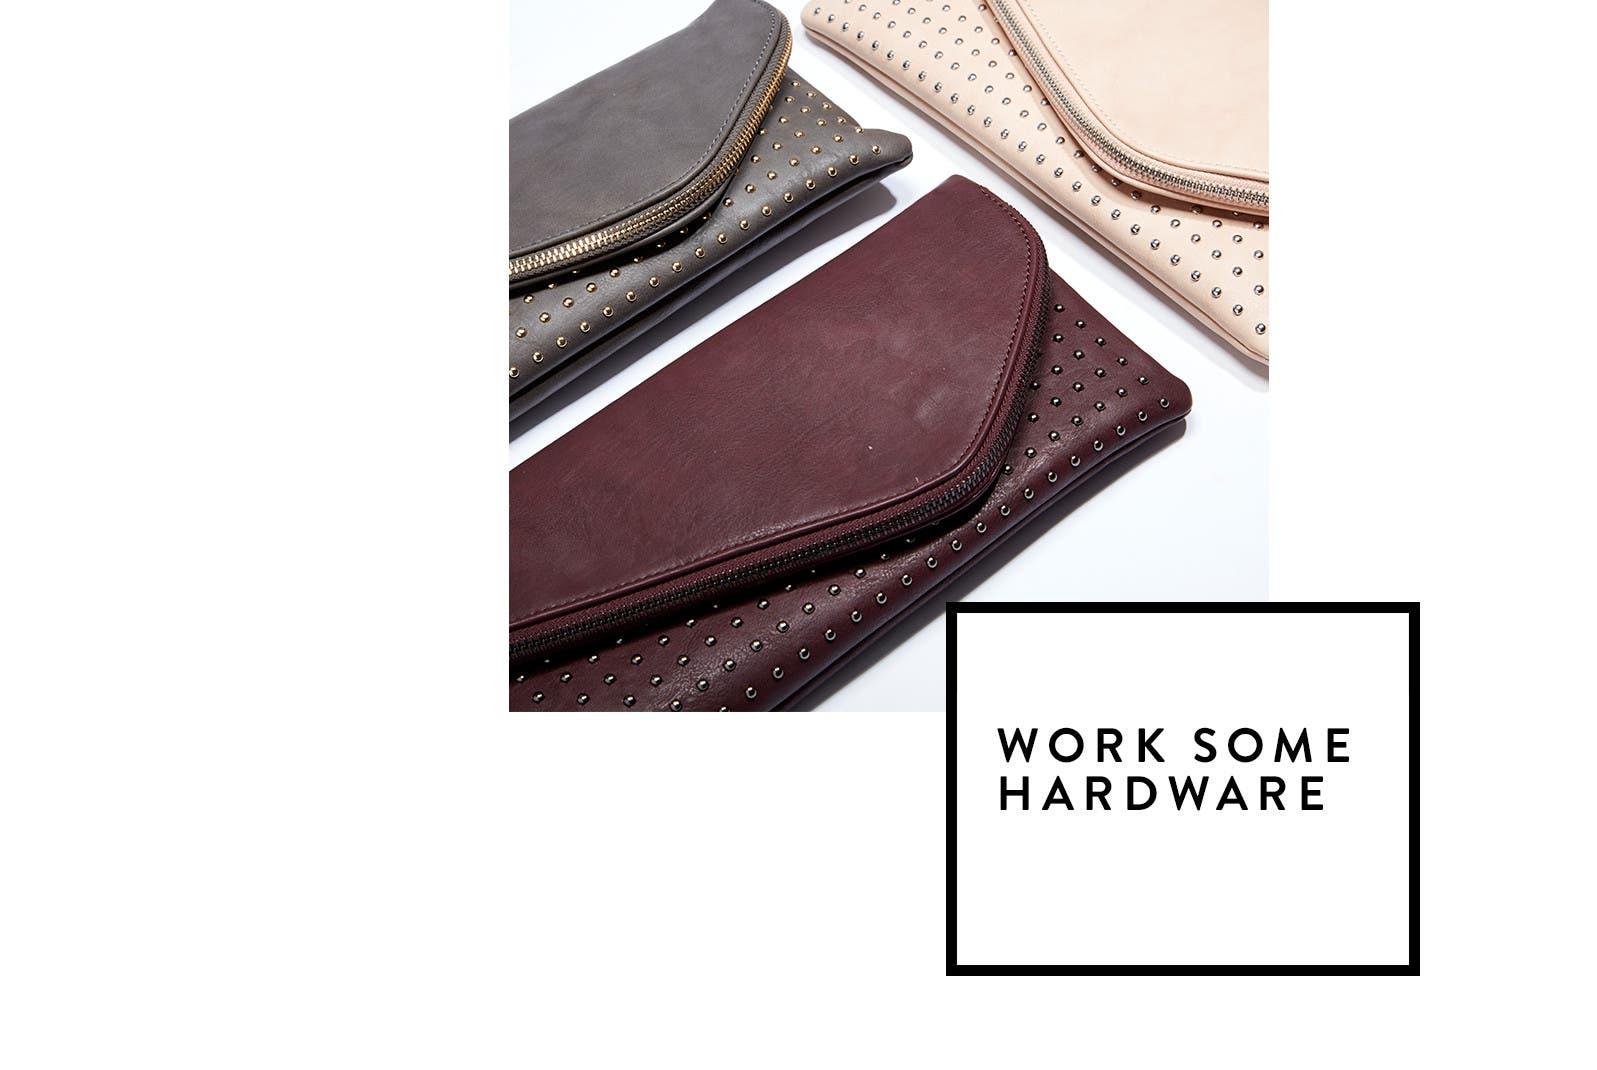 Work some hardware: metal embellished handbags.